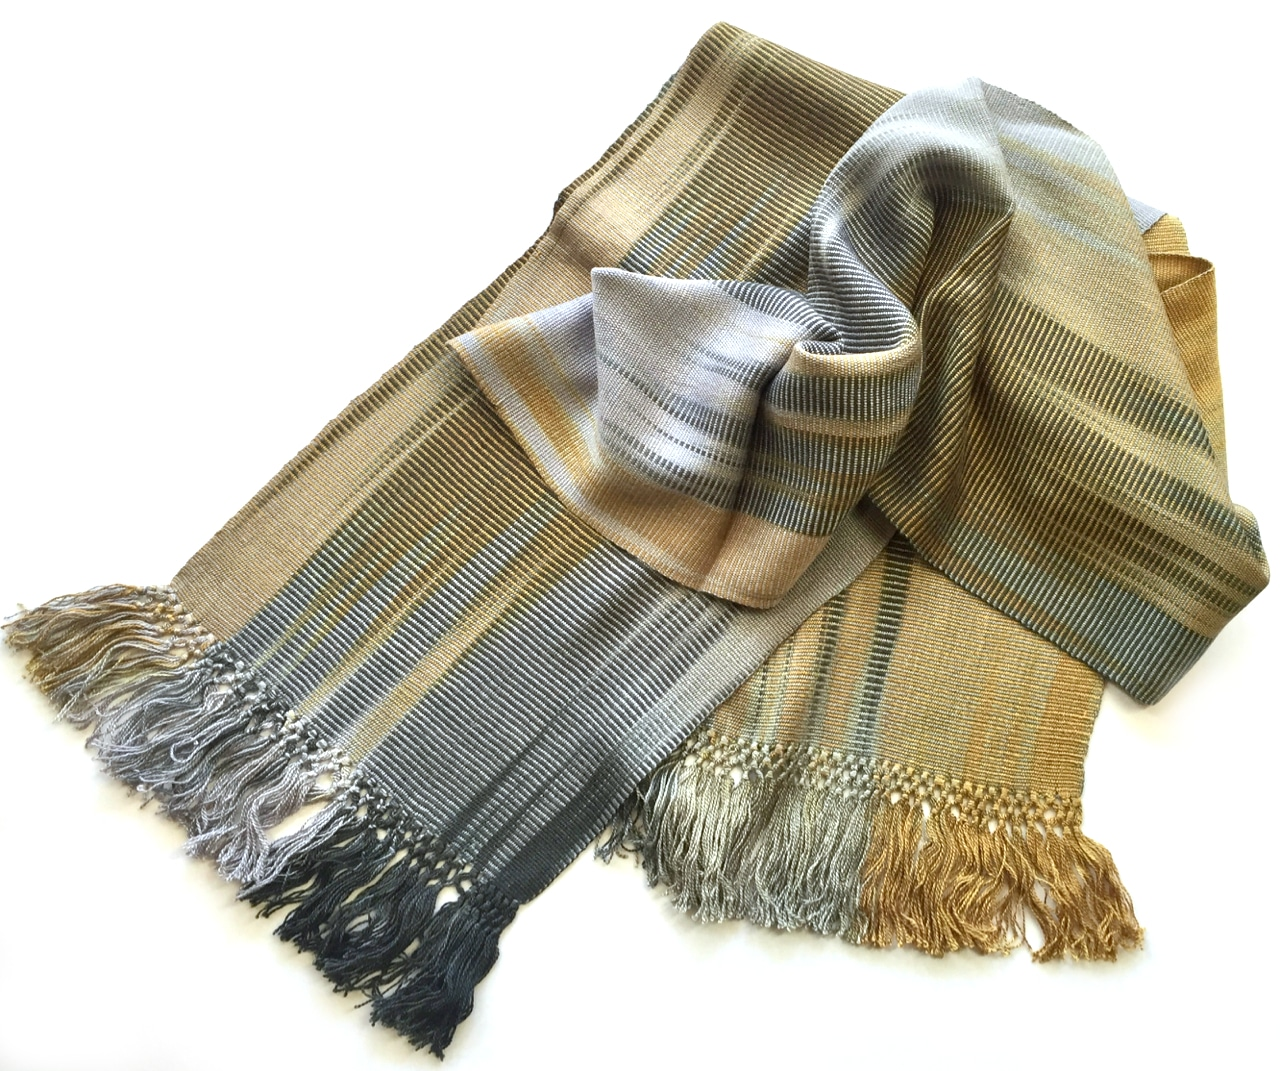 Gray, Gold, Black - Lightweight Bamboo Handwoven Scarf 8 x 68